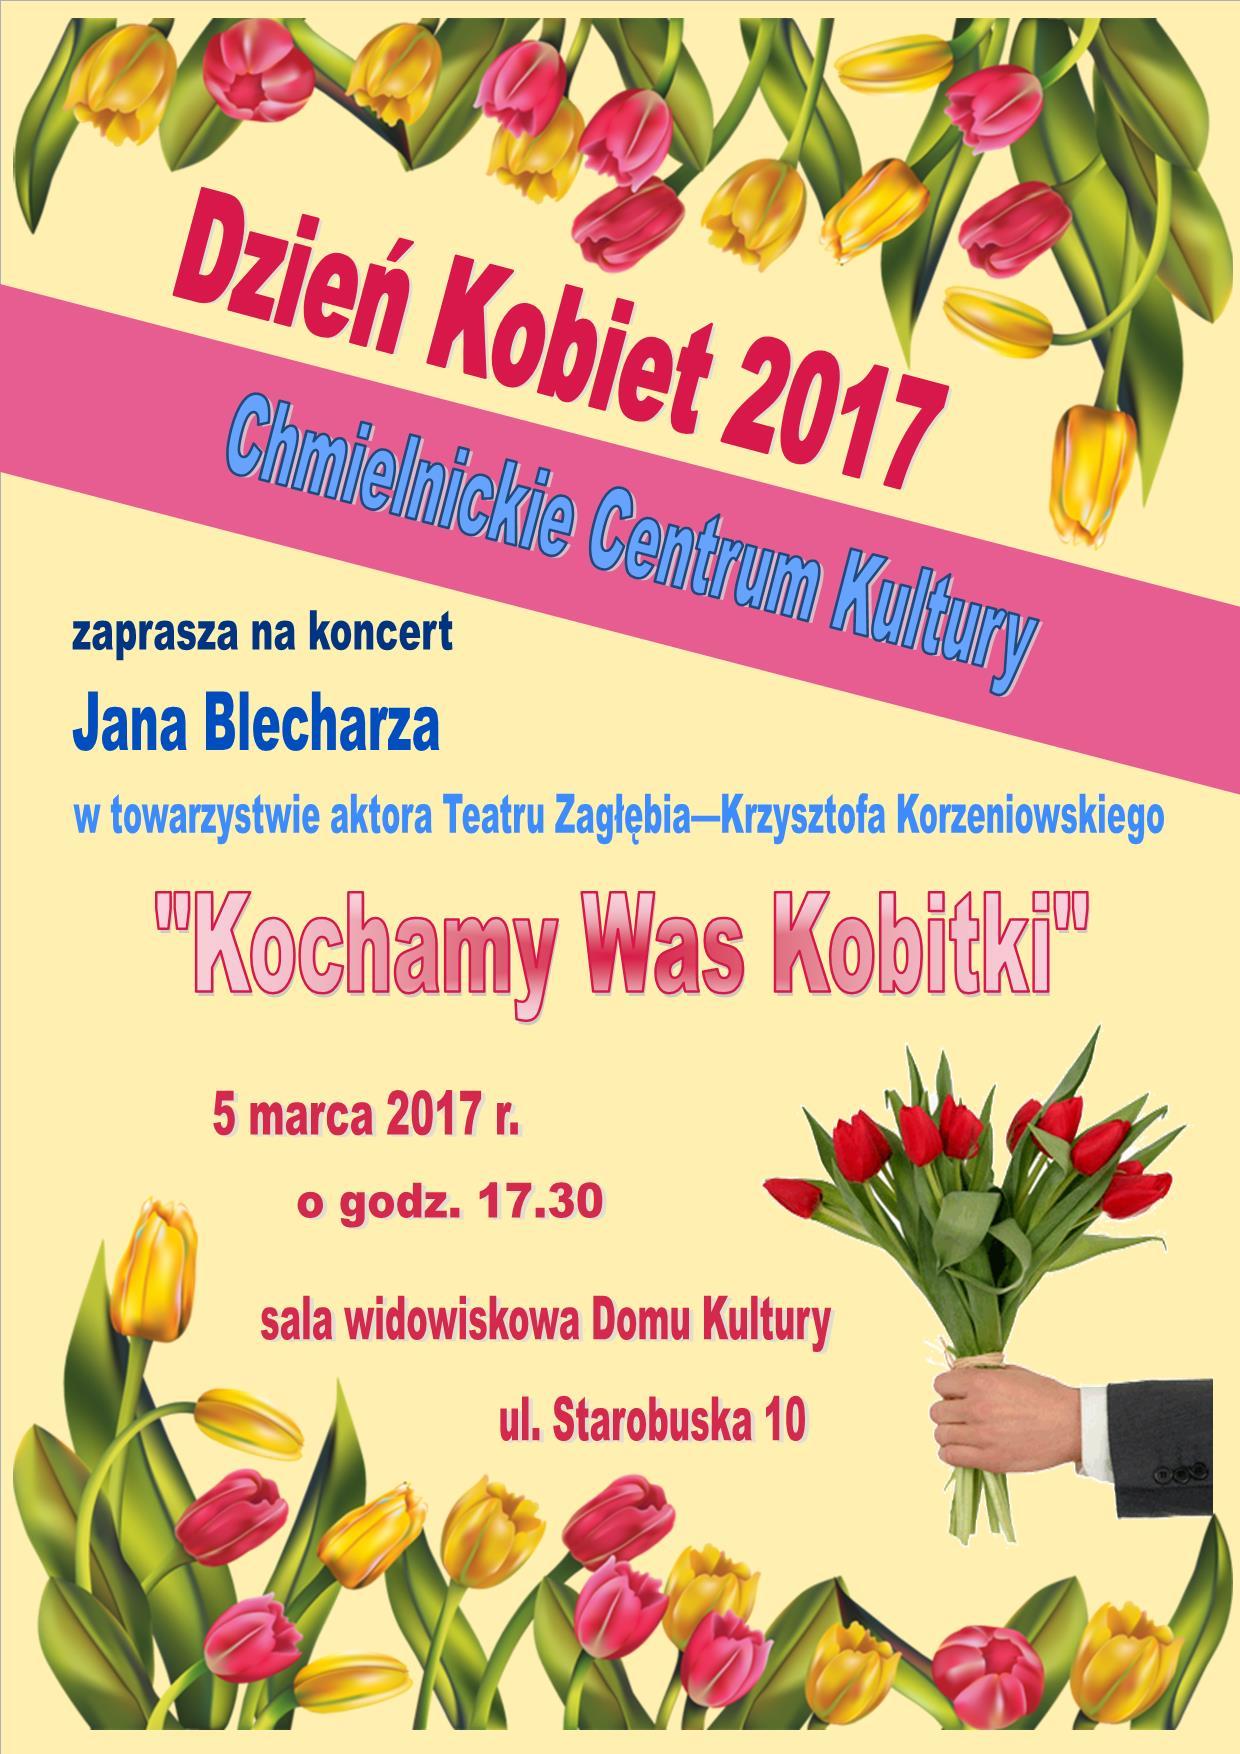 - plakat-_dzien_kobiet_2017.jpg